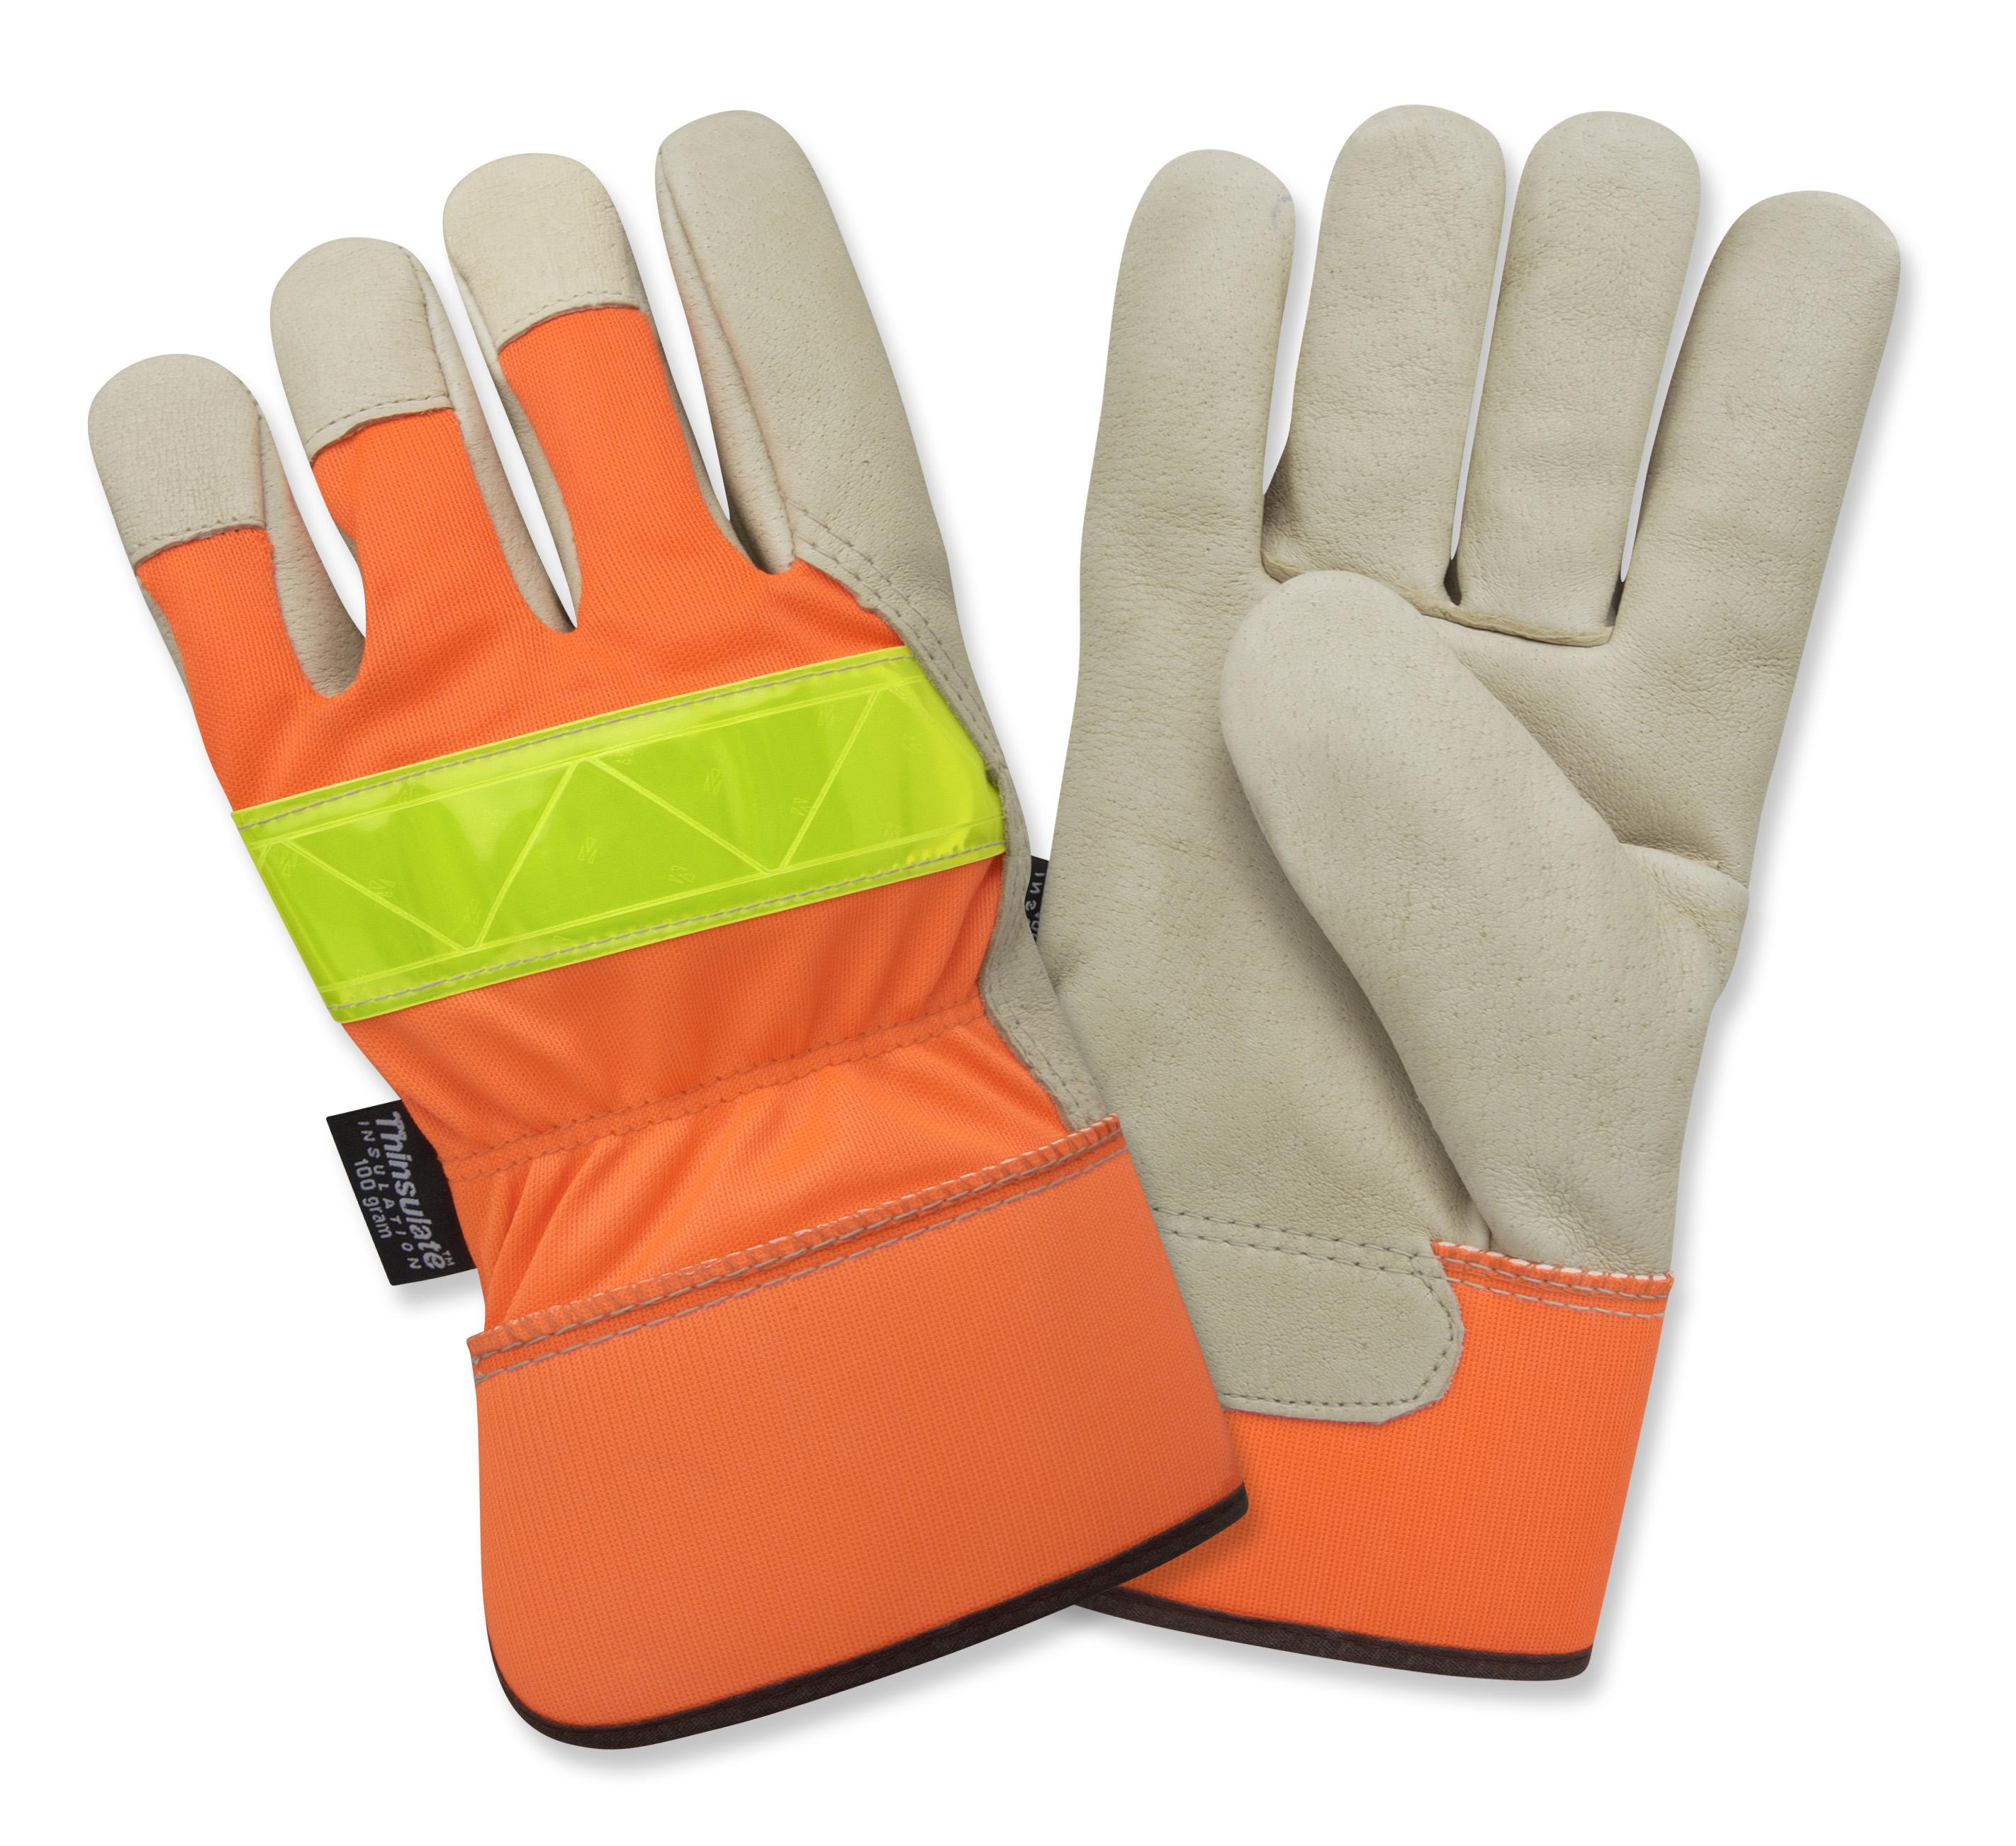 Cotton Rubber Hand Gloves